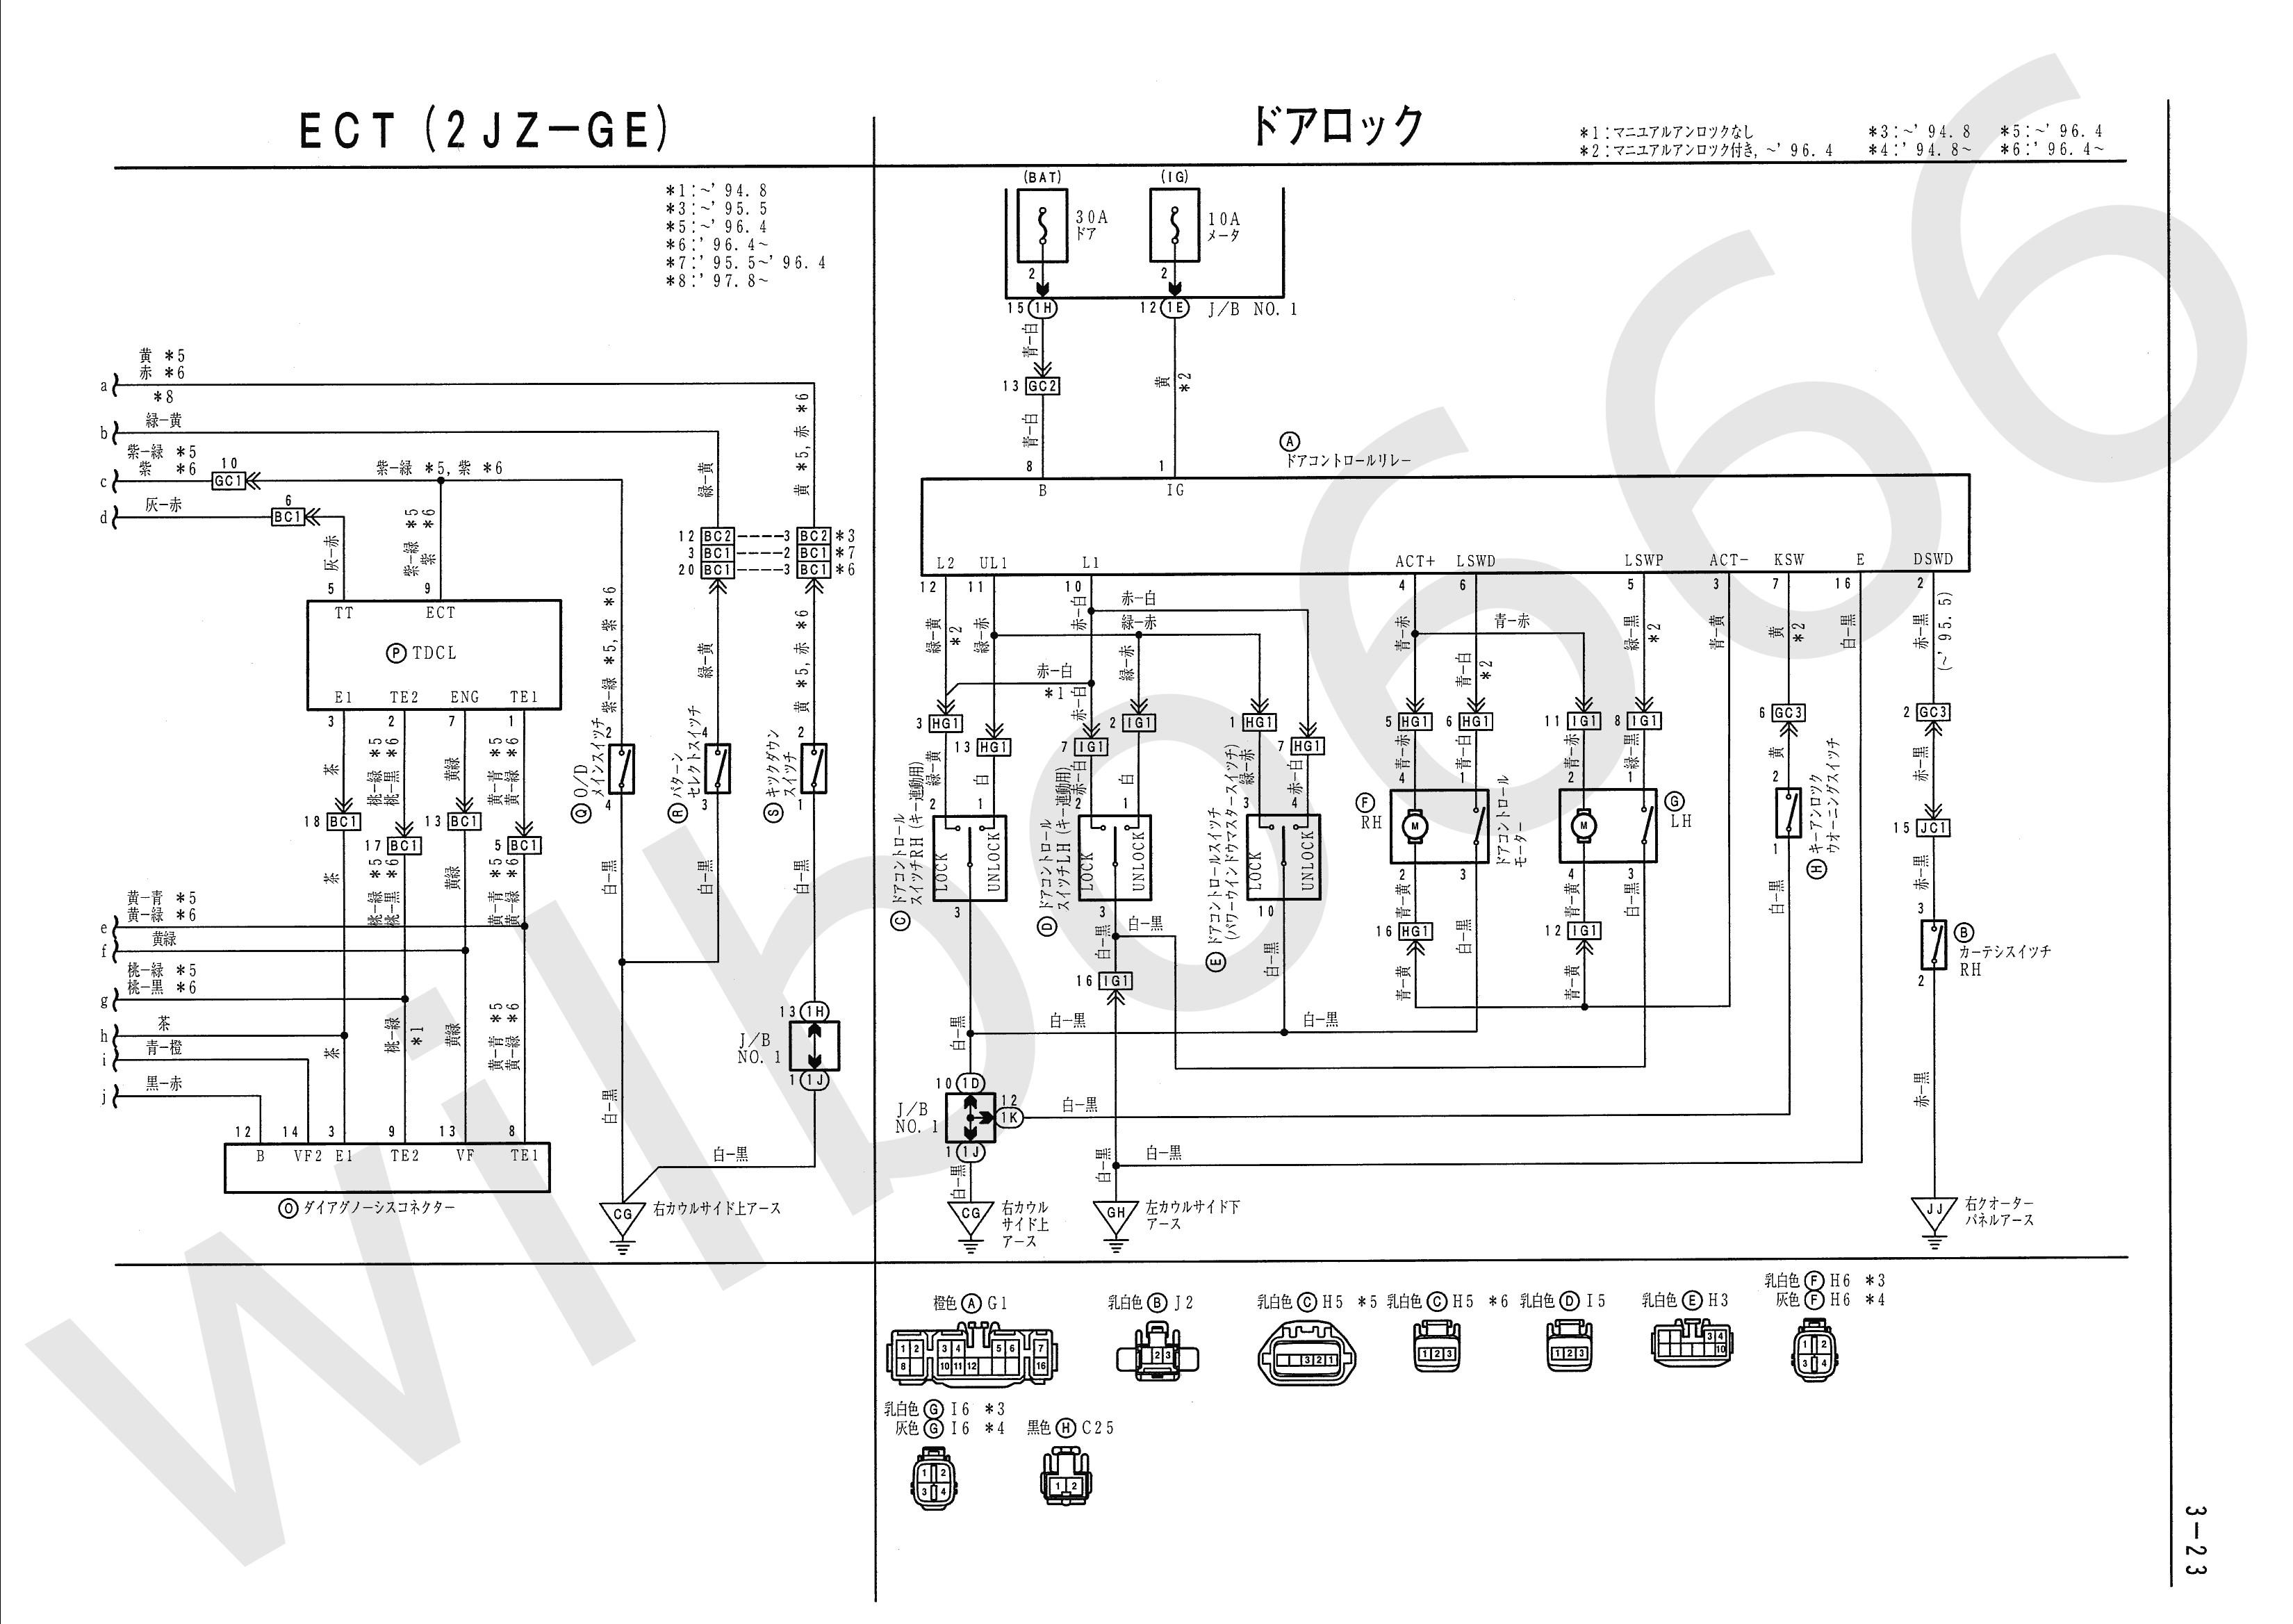 Throttle    Position       Sensor       Wiring       Diagram         Wiring       Diagram    Image